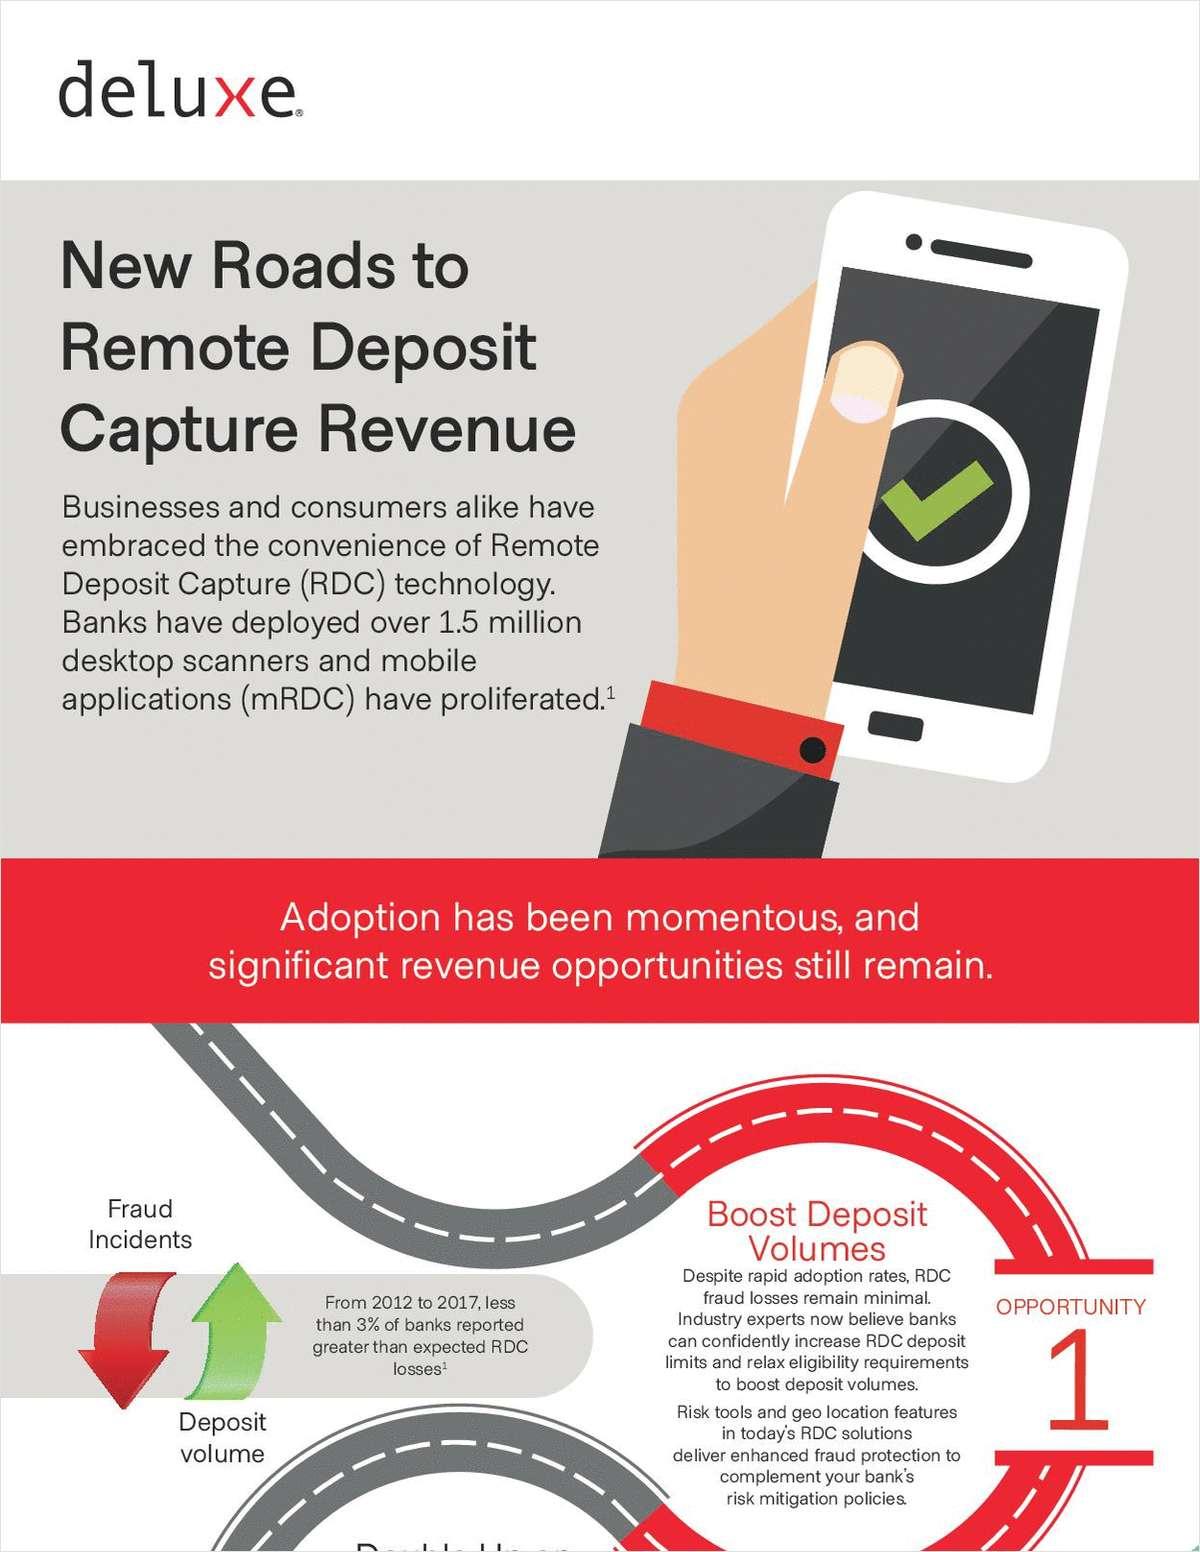 New Roads to Remote Deposit Capture Revenue